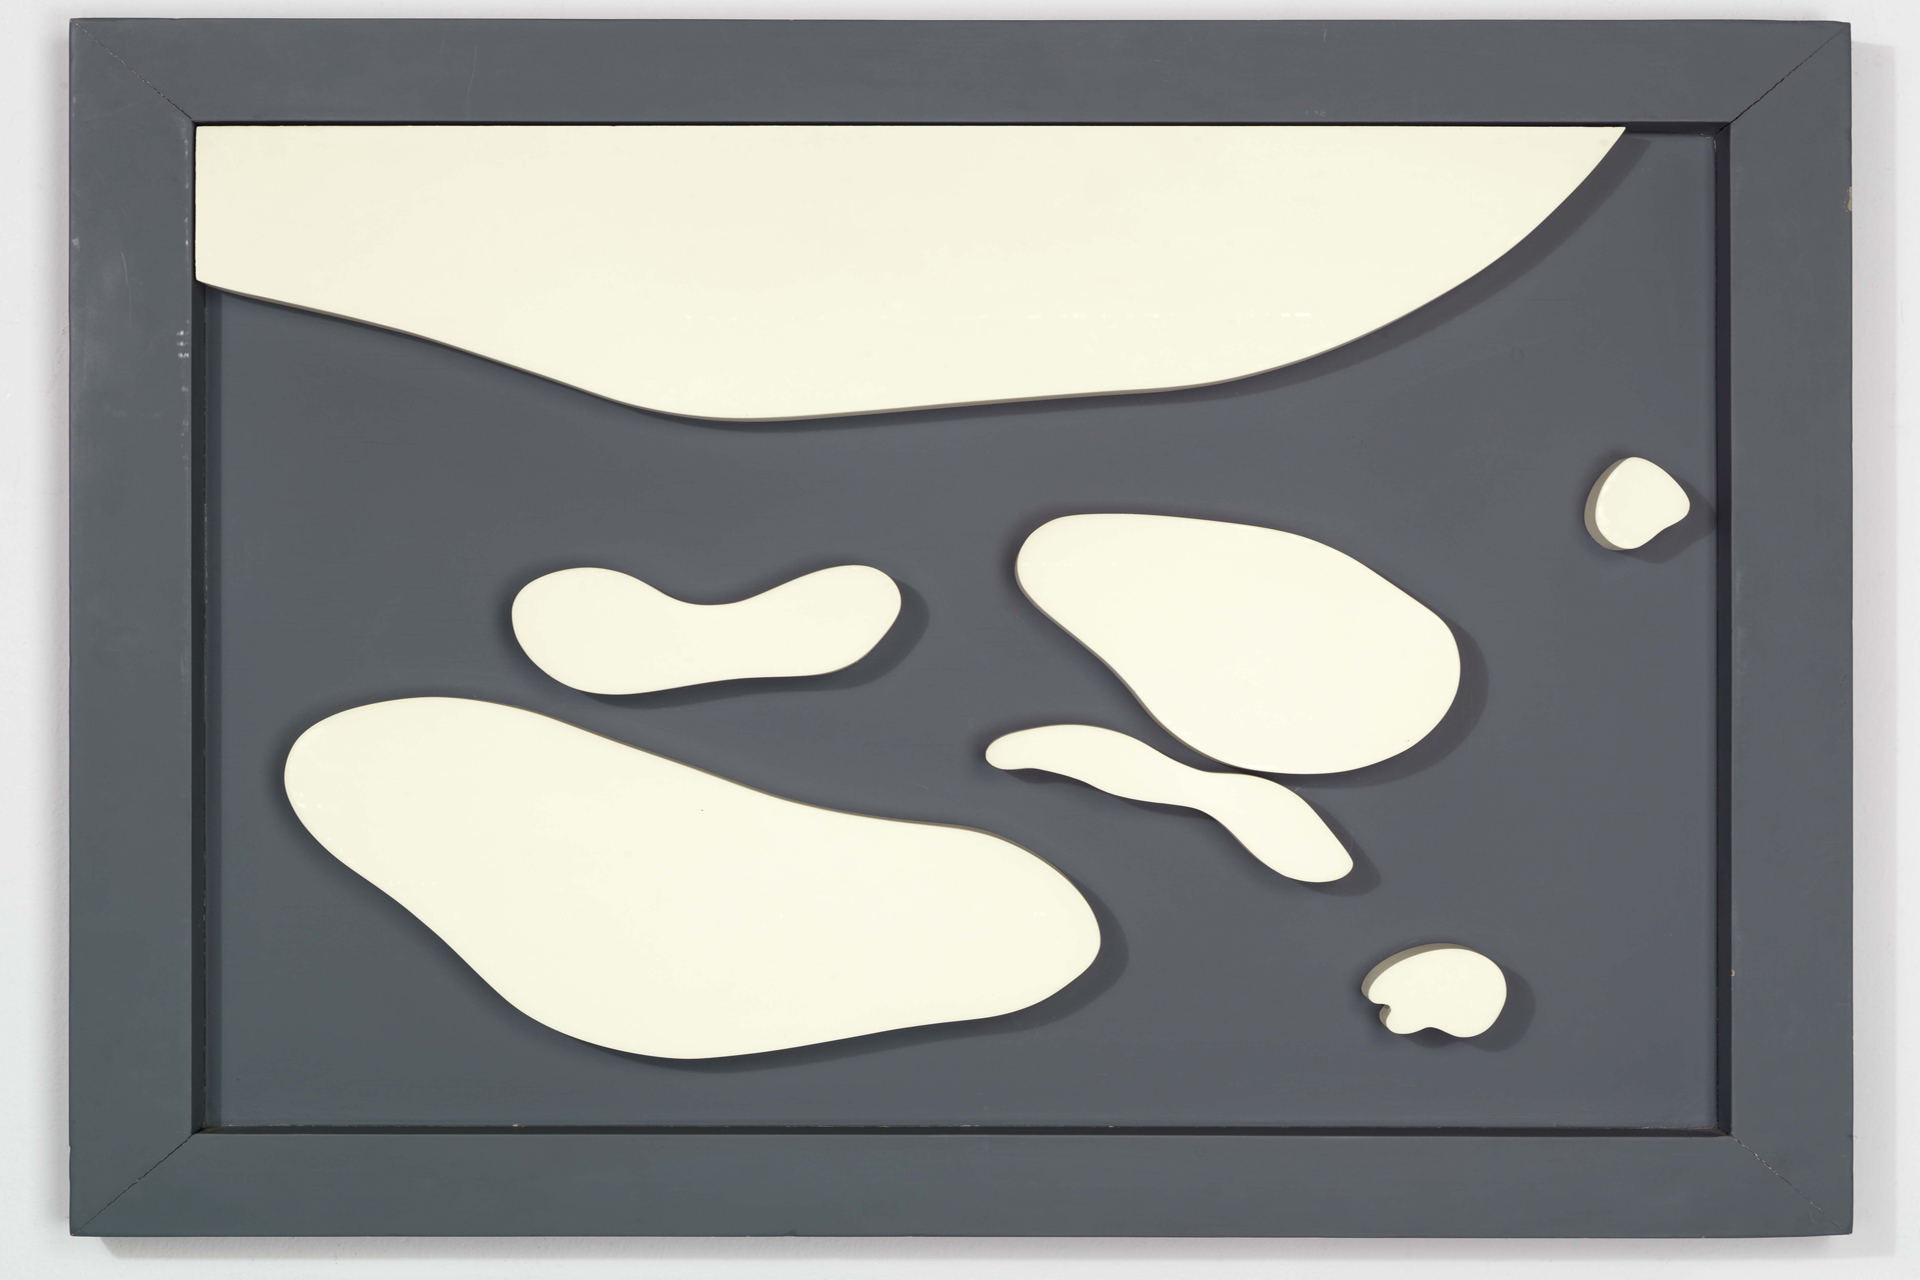 Hans Arp, Konstellation, 1932 Holz, bemalt 70,5 x 85,3 cm